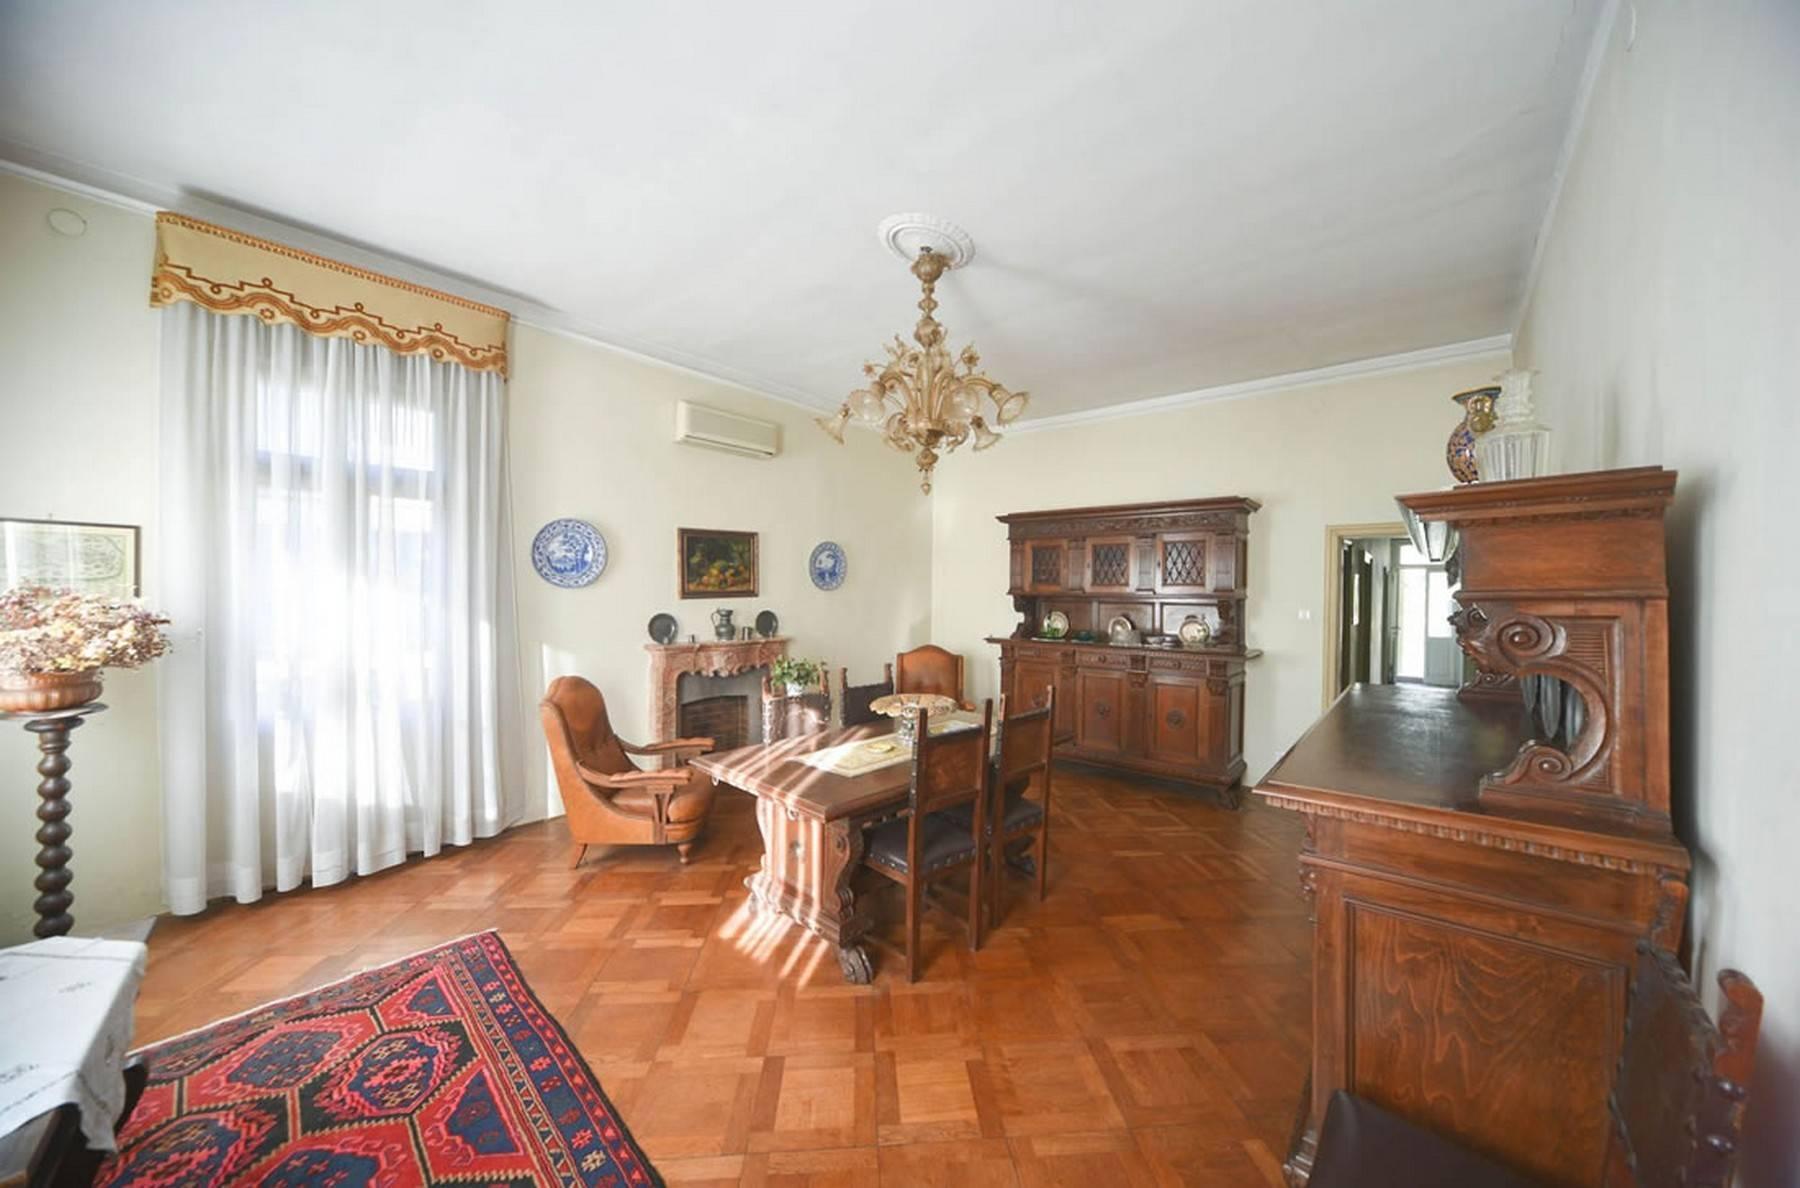 Villa Bianca im Stadtteil Lido - 5